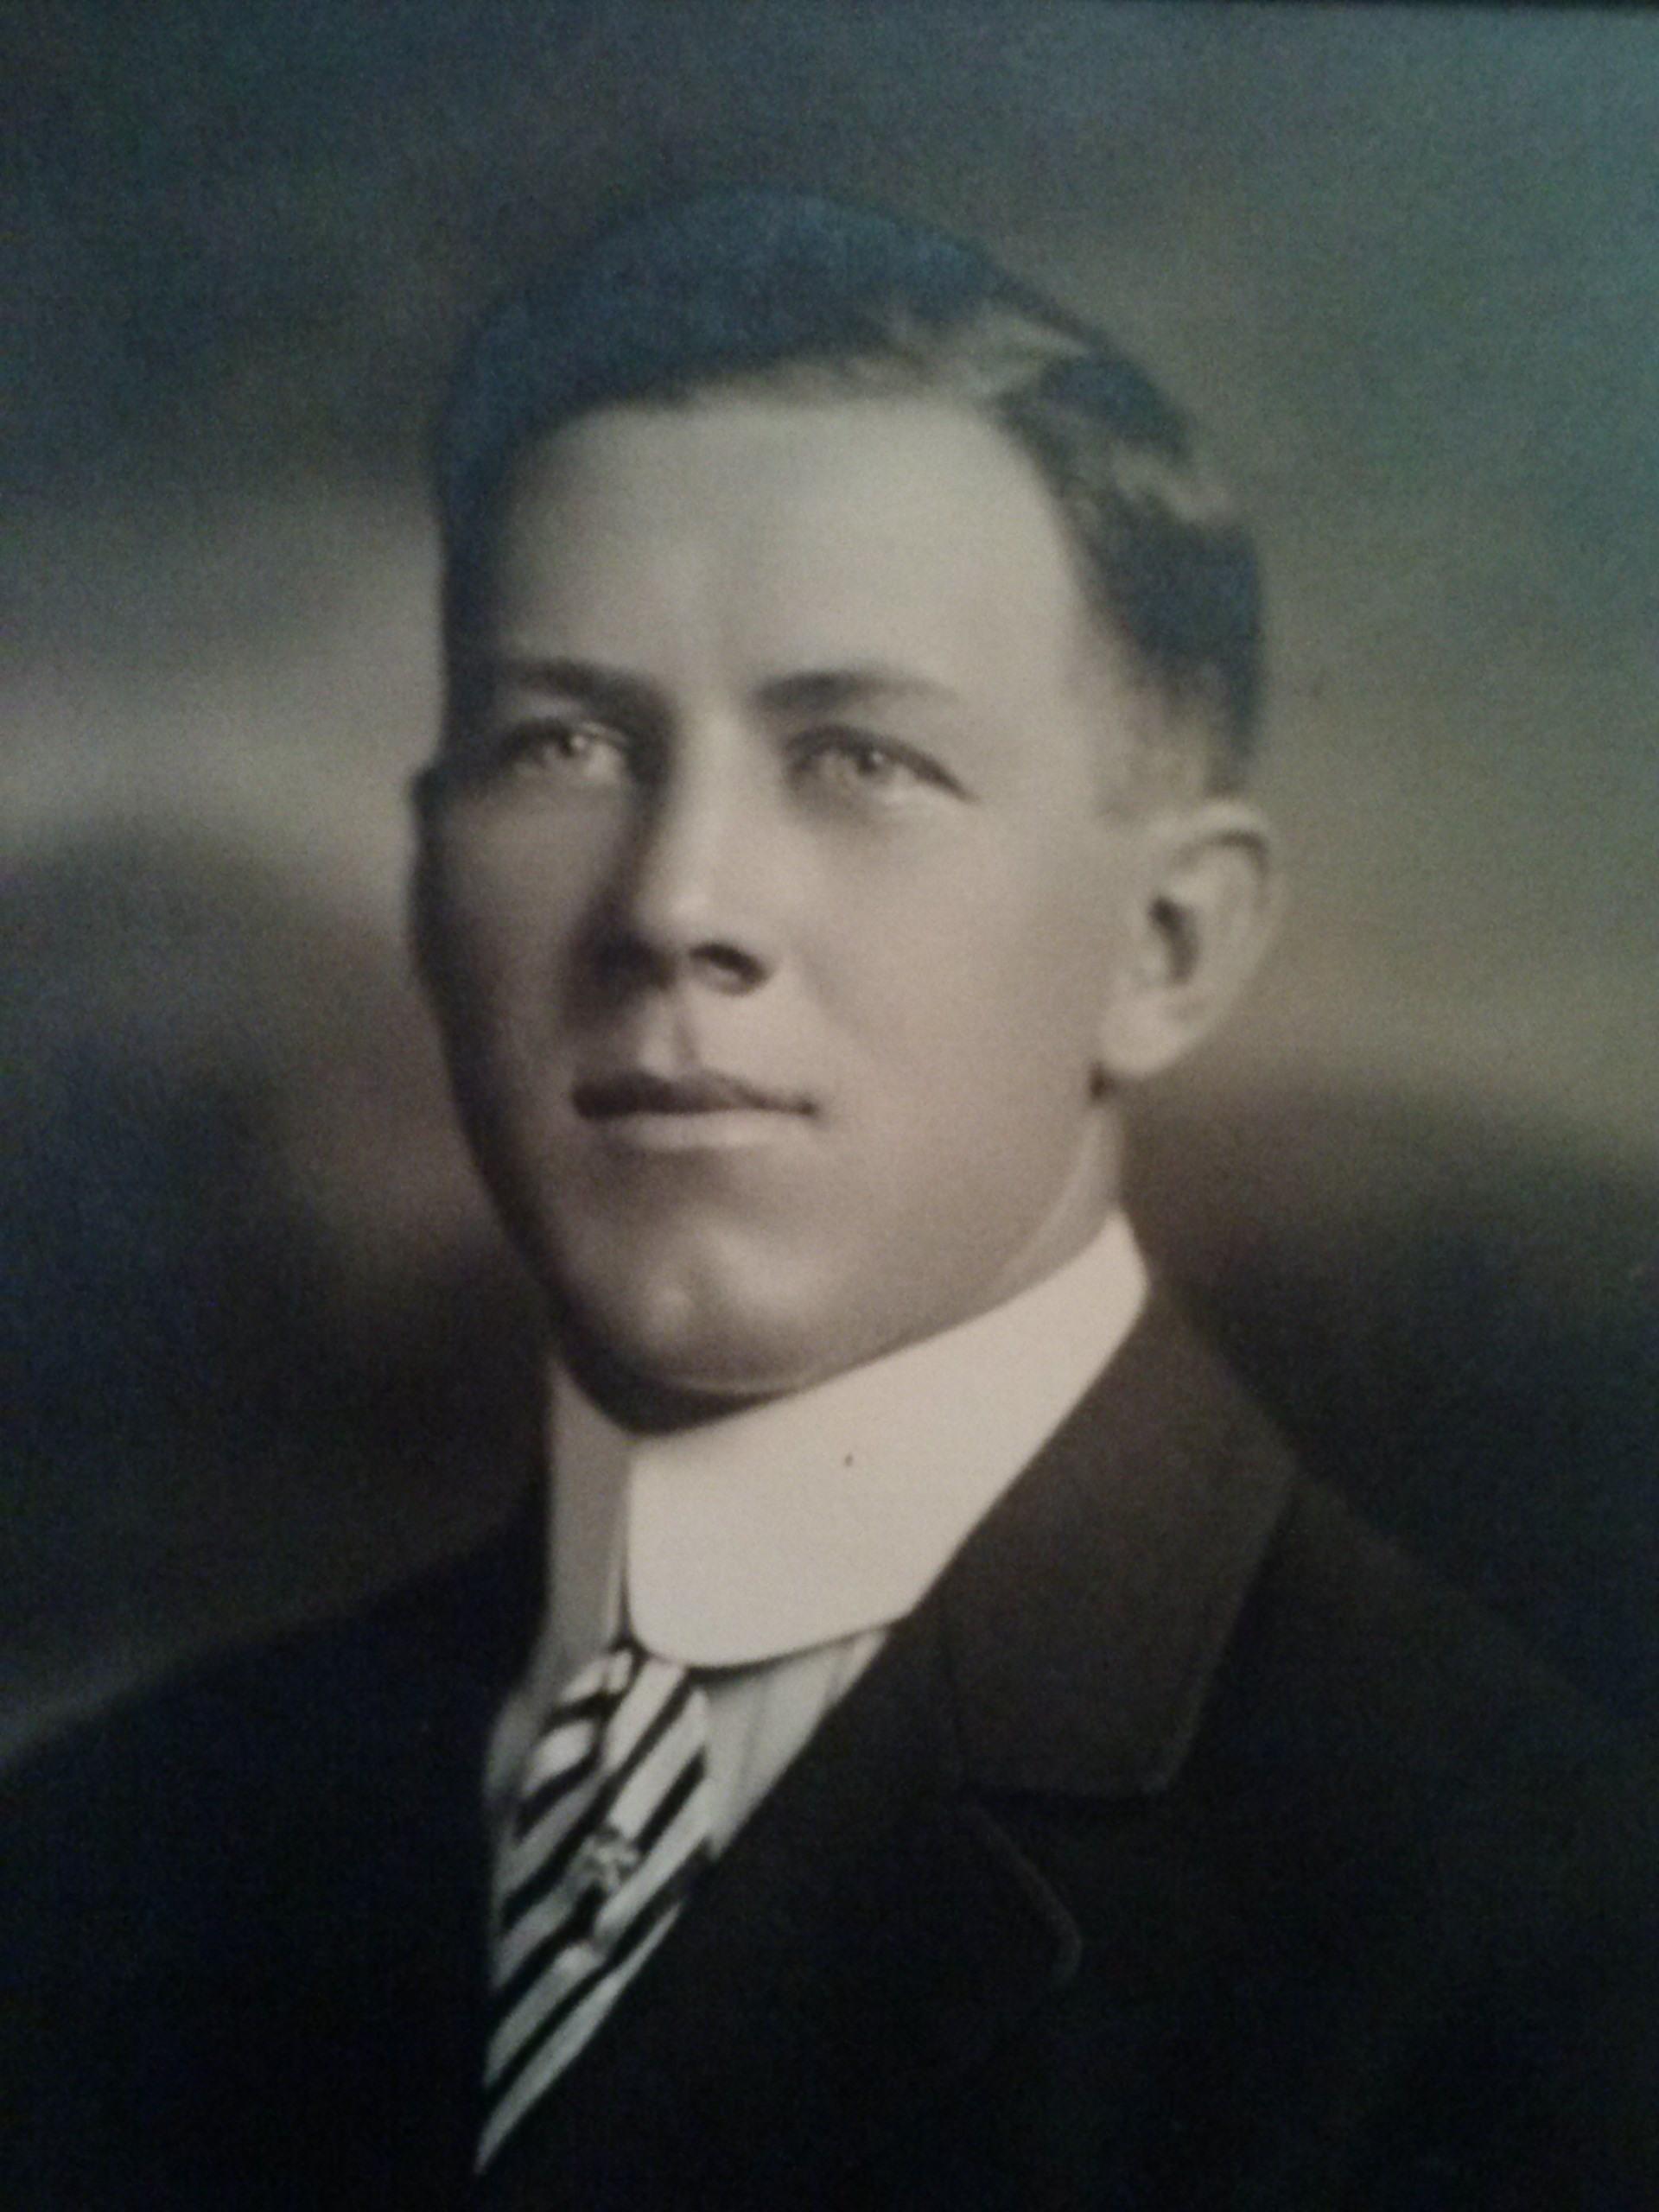 Everett Young